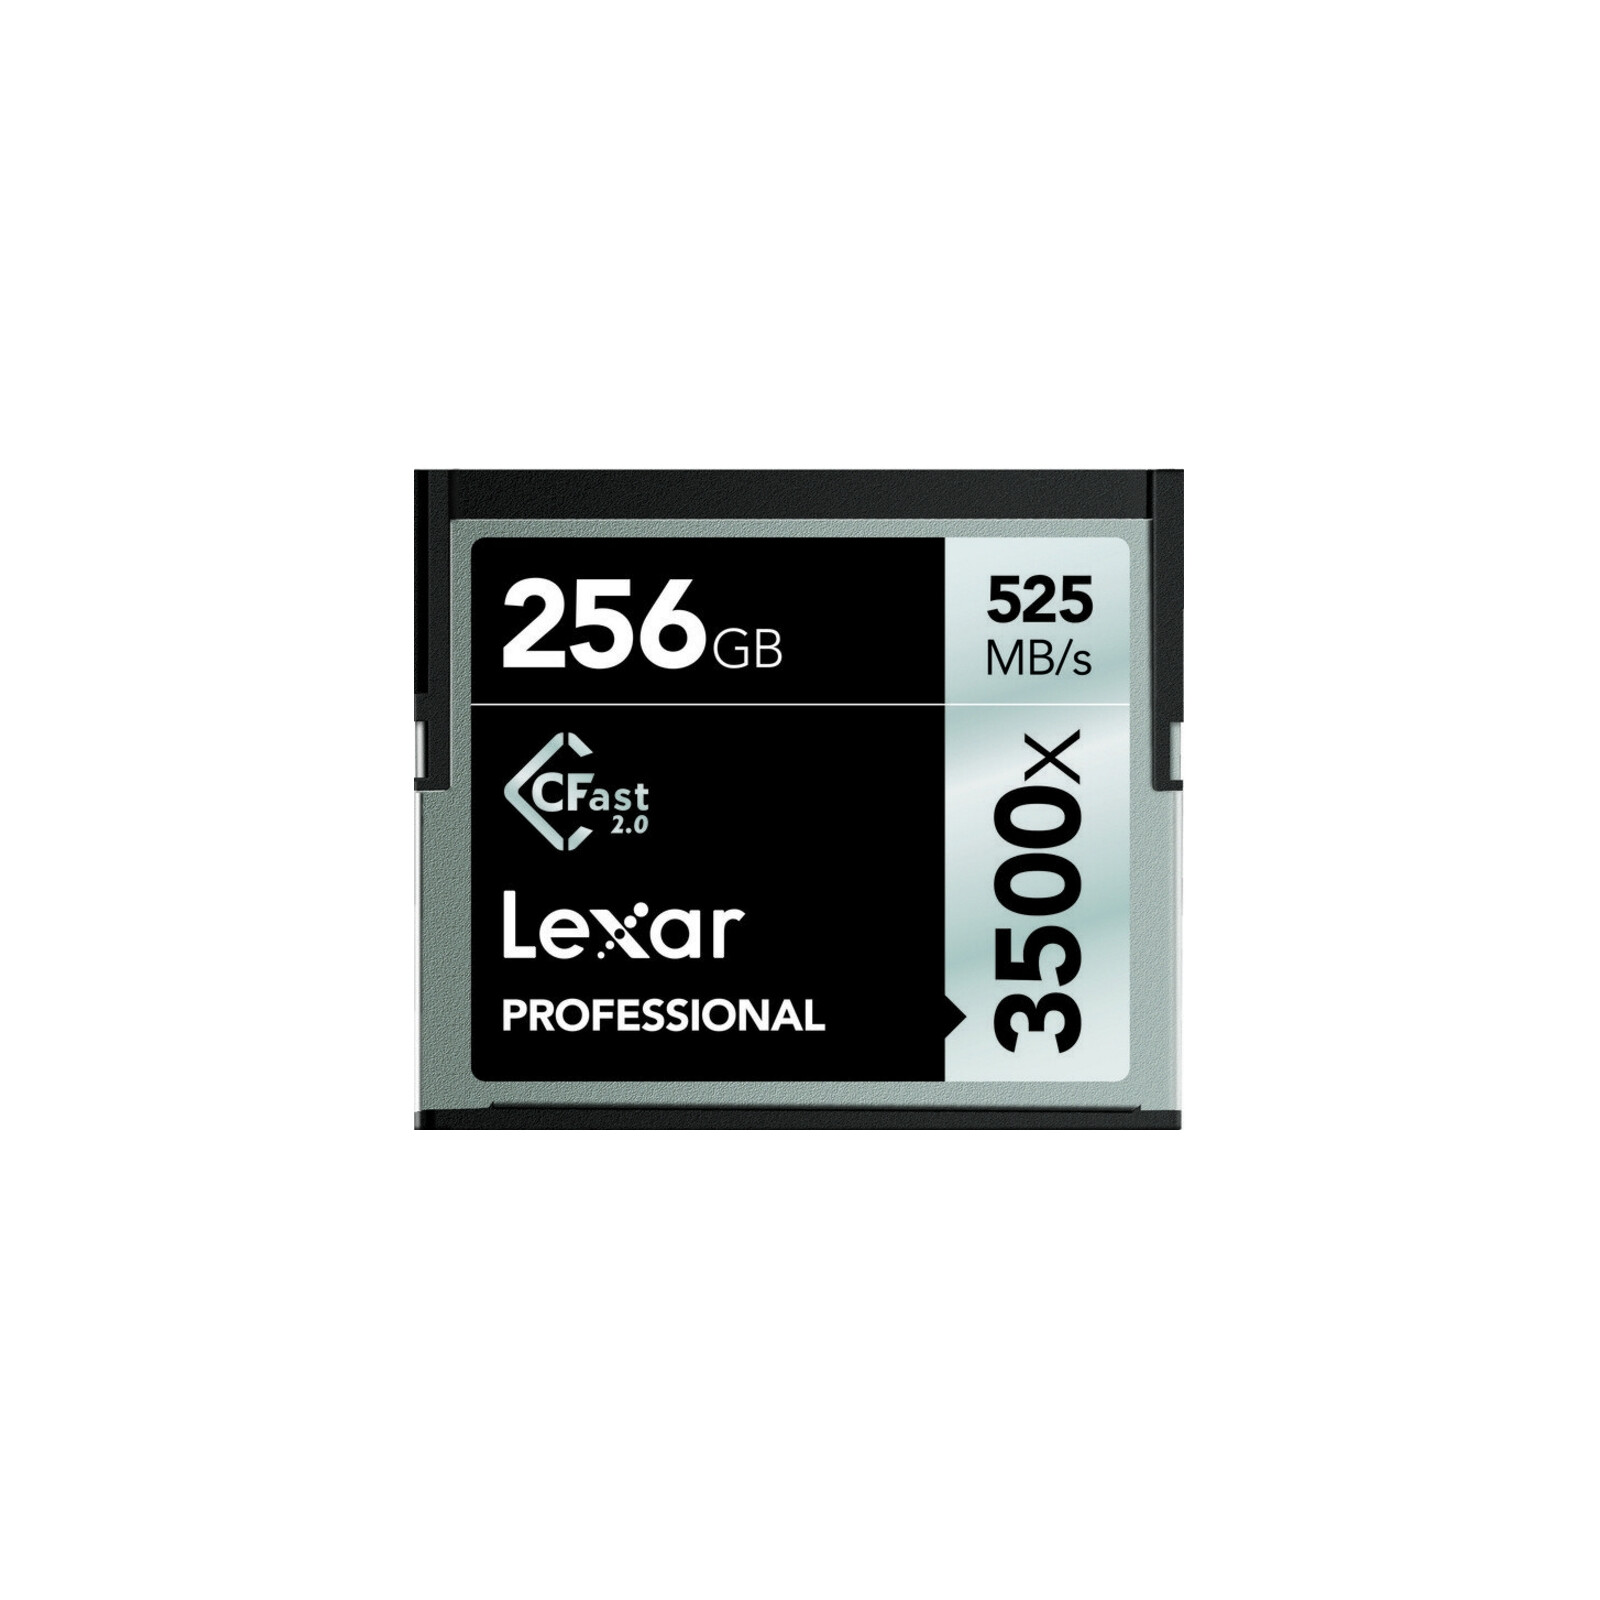 Lexar Cfast 256GB 525MB/s